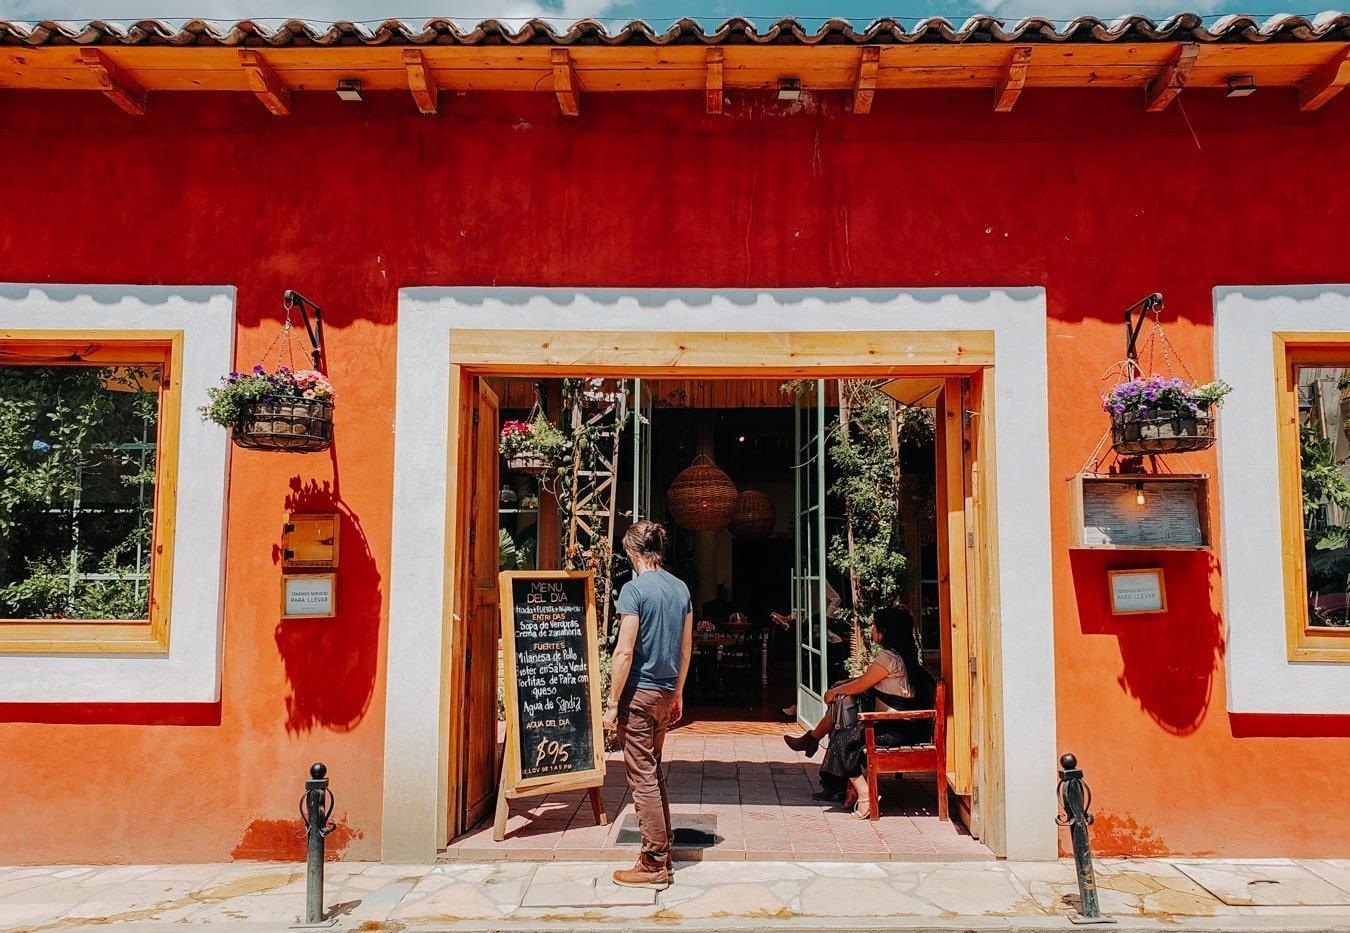 sarajevo garden cafe san cristobal de las casas